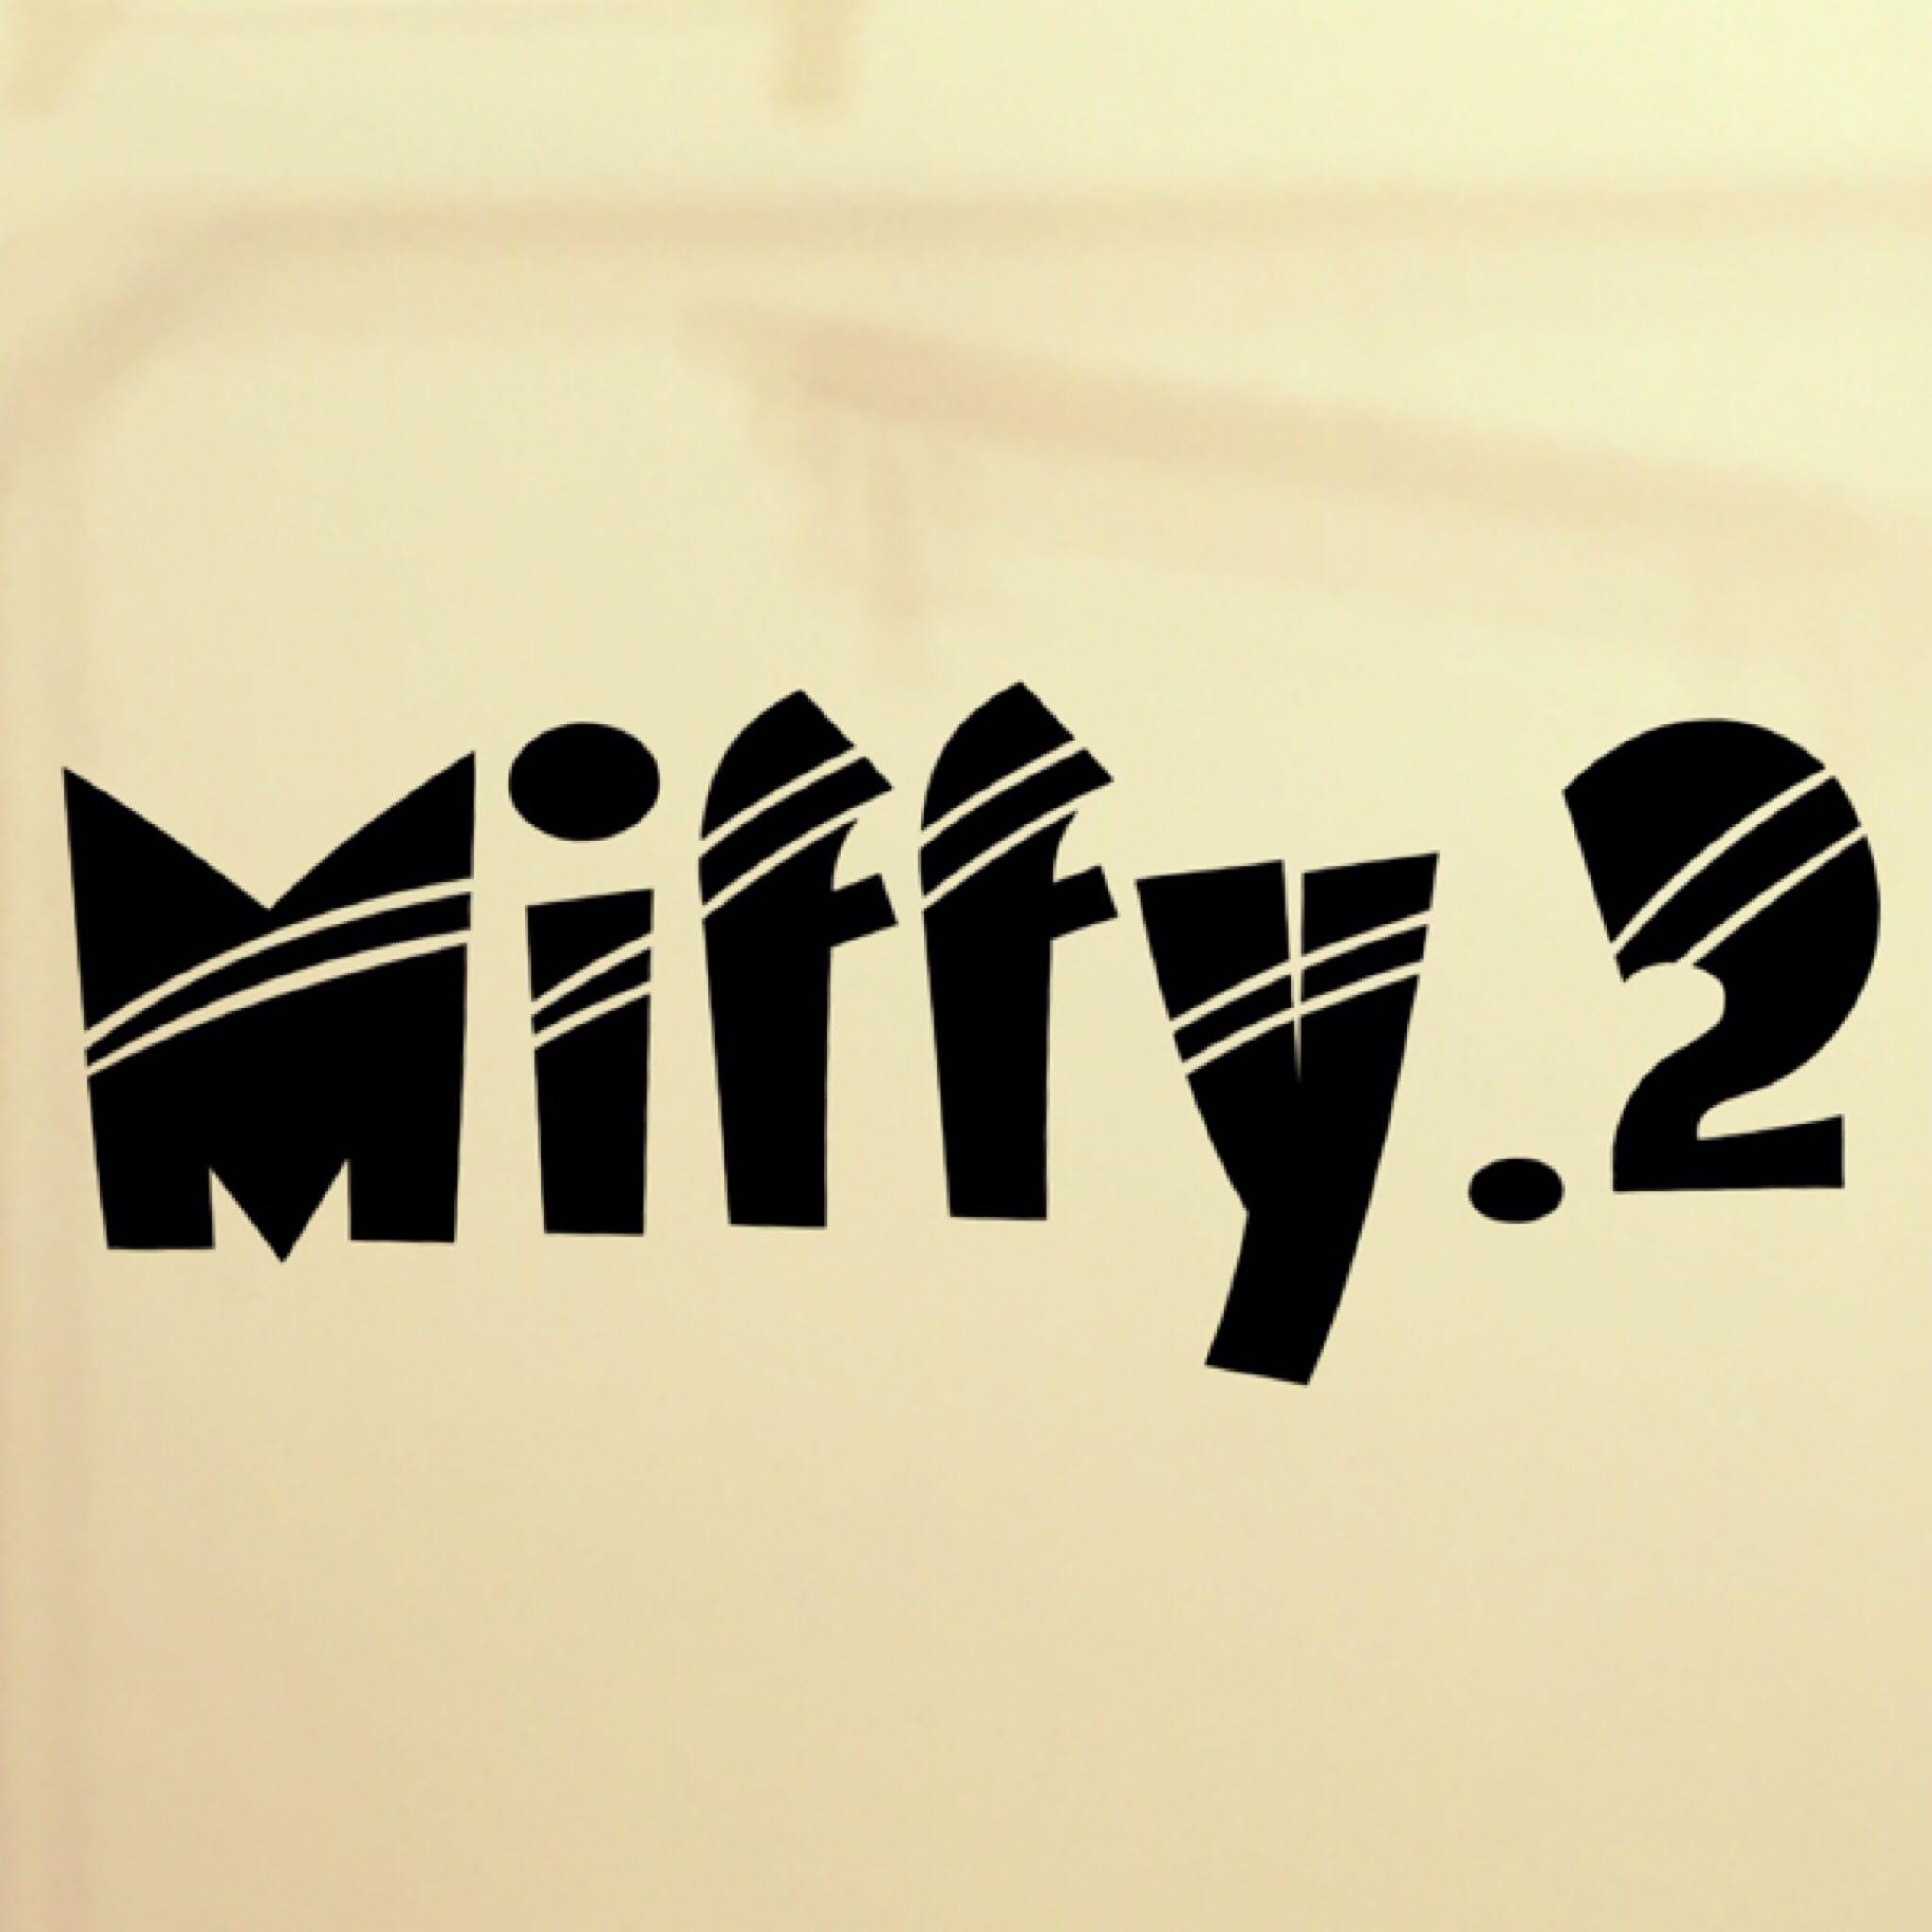 miffy.2